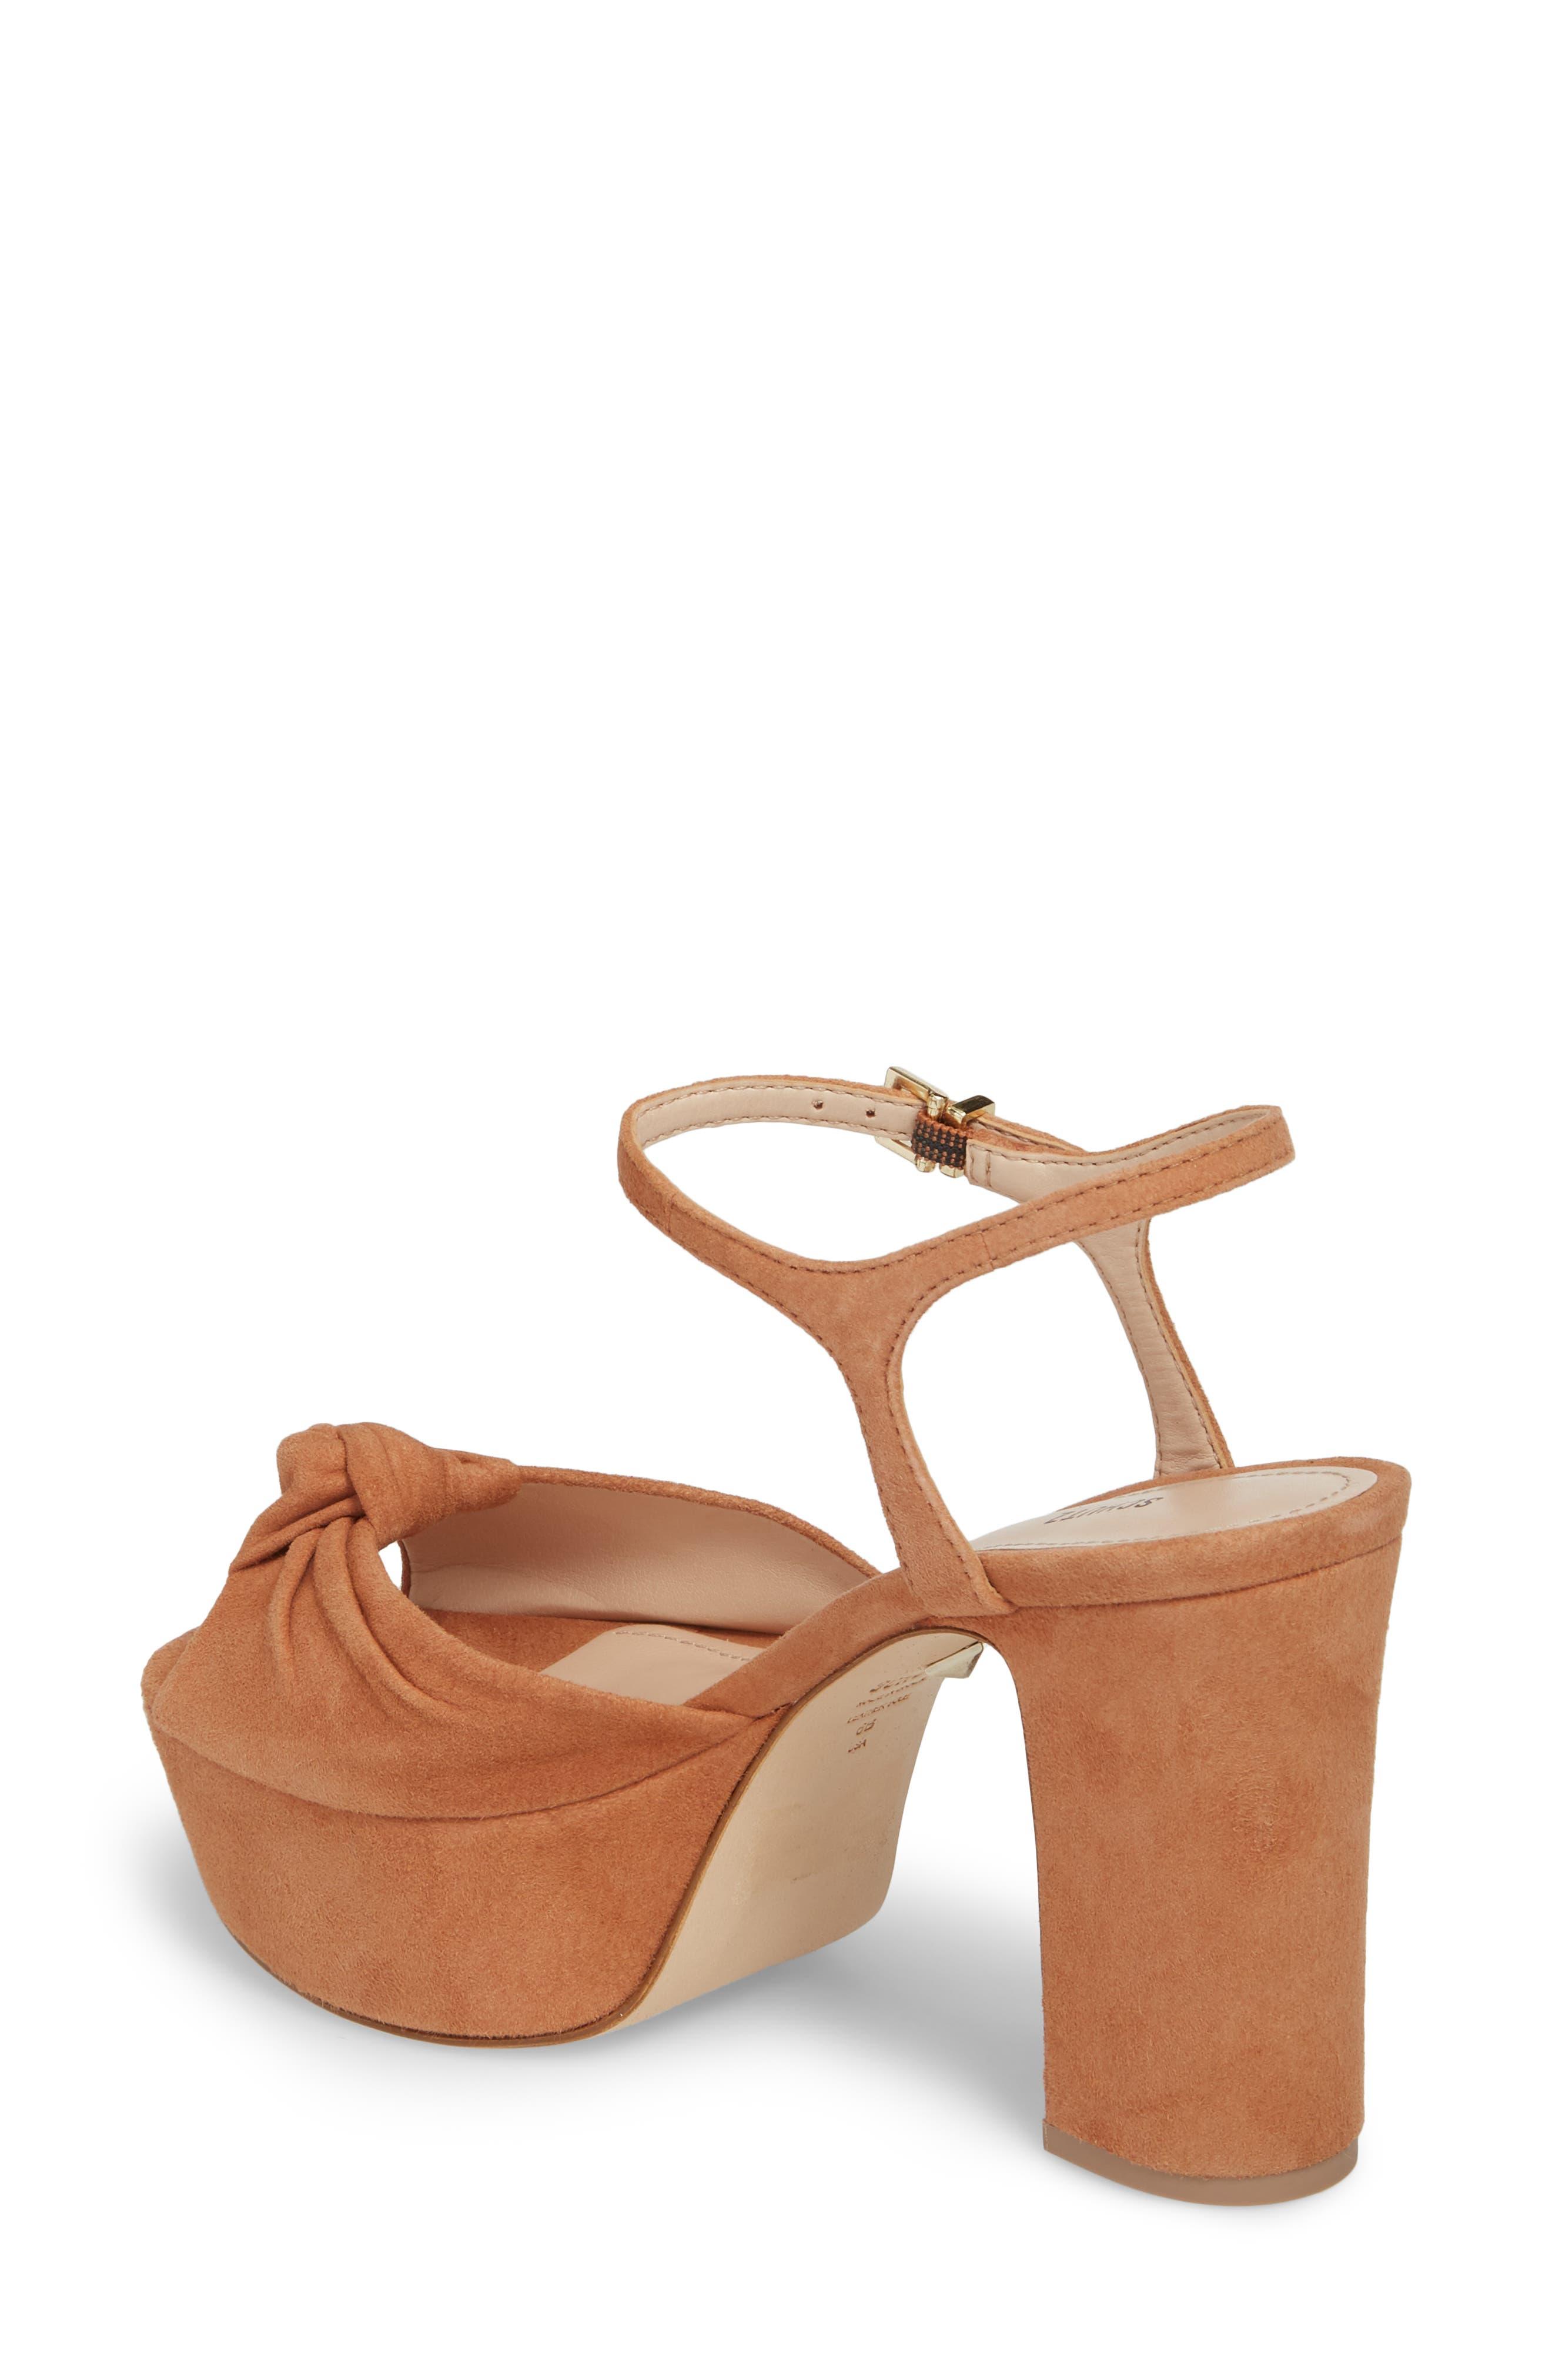 Thalyta Platform Sandal,                             Alternate thumbnail 2, color,                             Toasted Nut